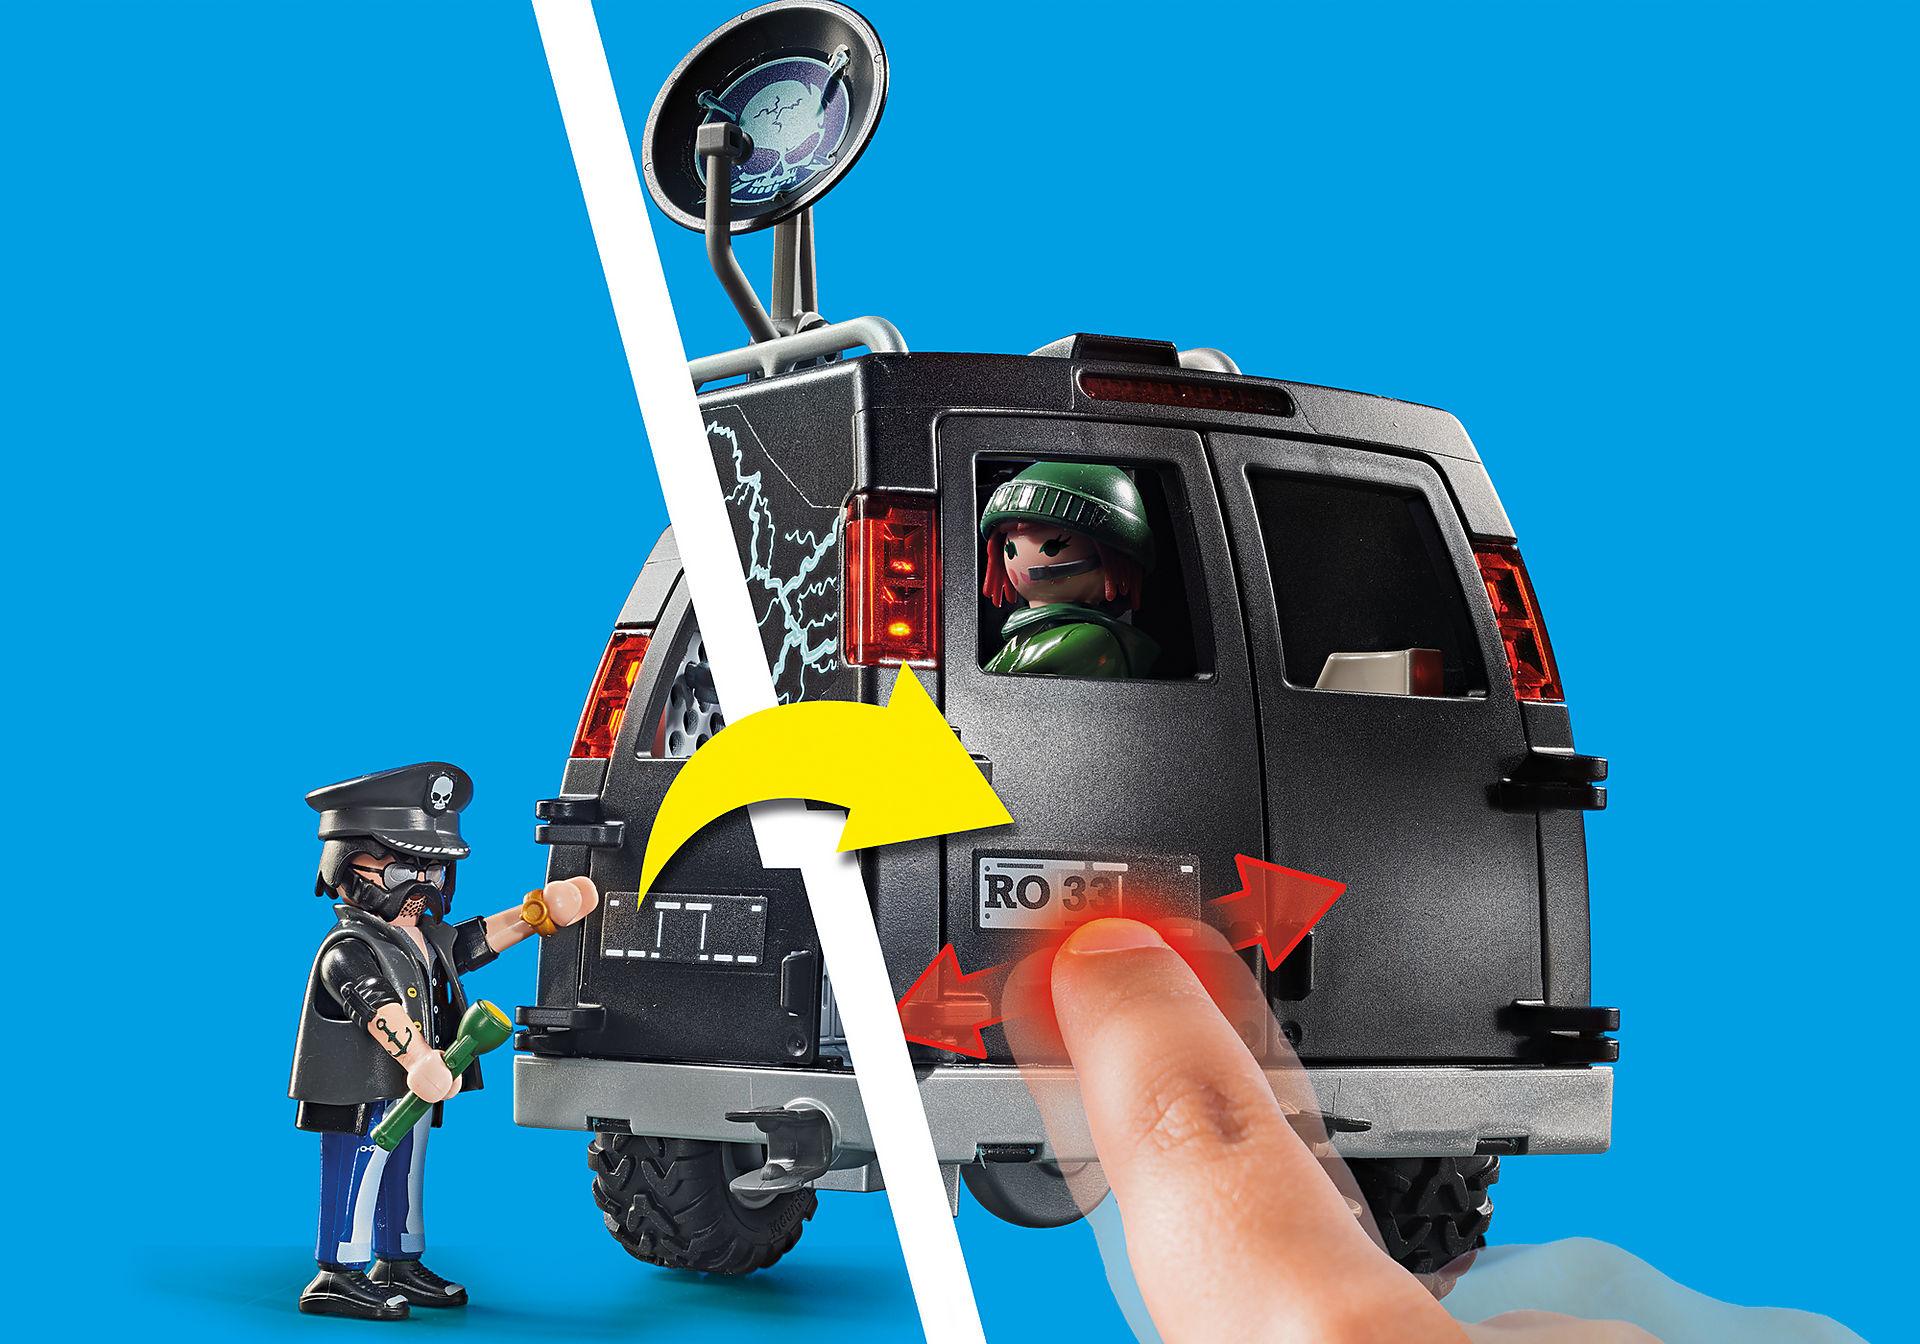 70575 Polizei-Helikopter: Verfolgung des Fluchtfahrzeugs zoom image6